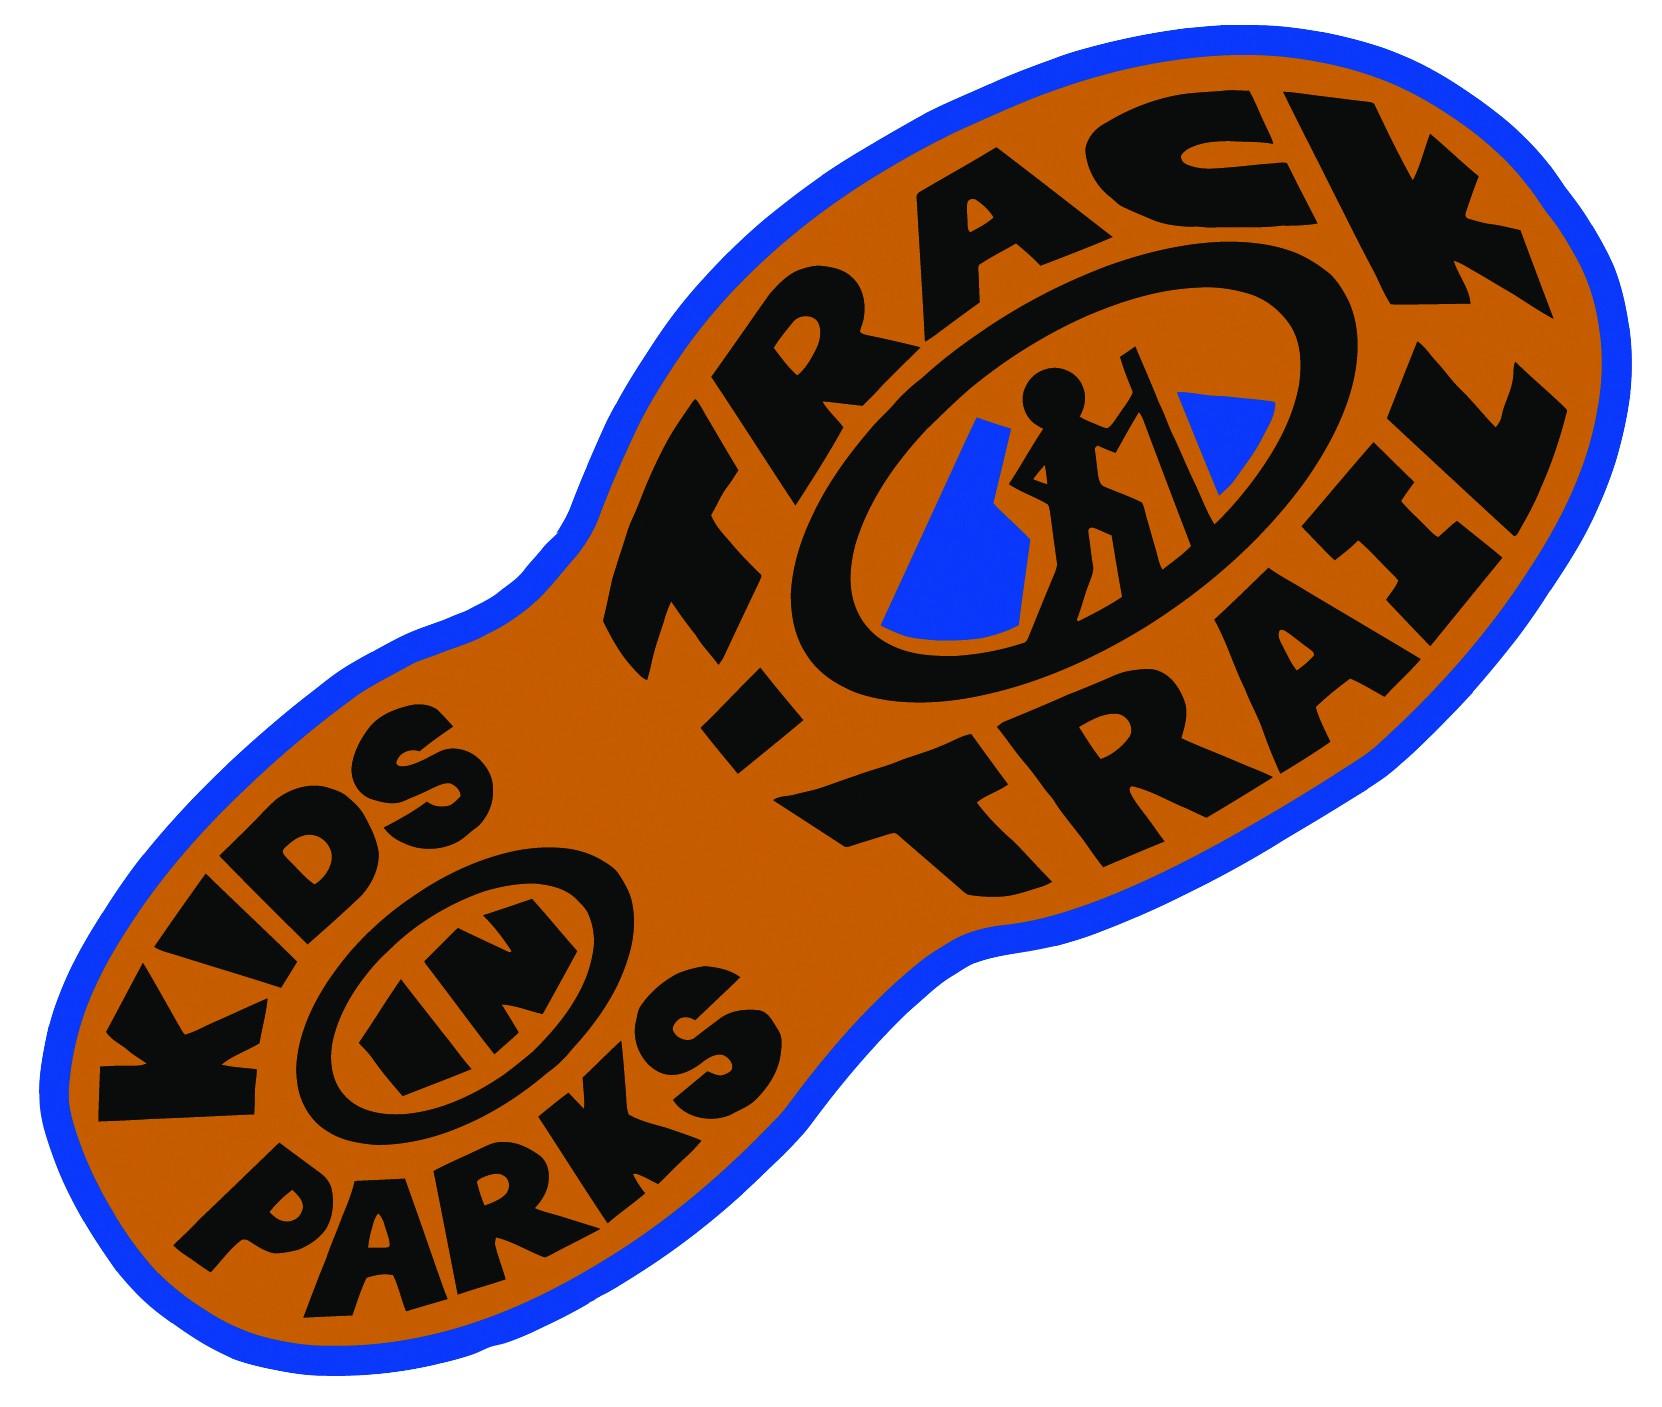 Kids in Parks Track Trail logo